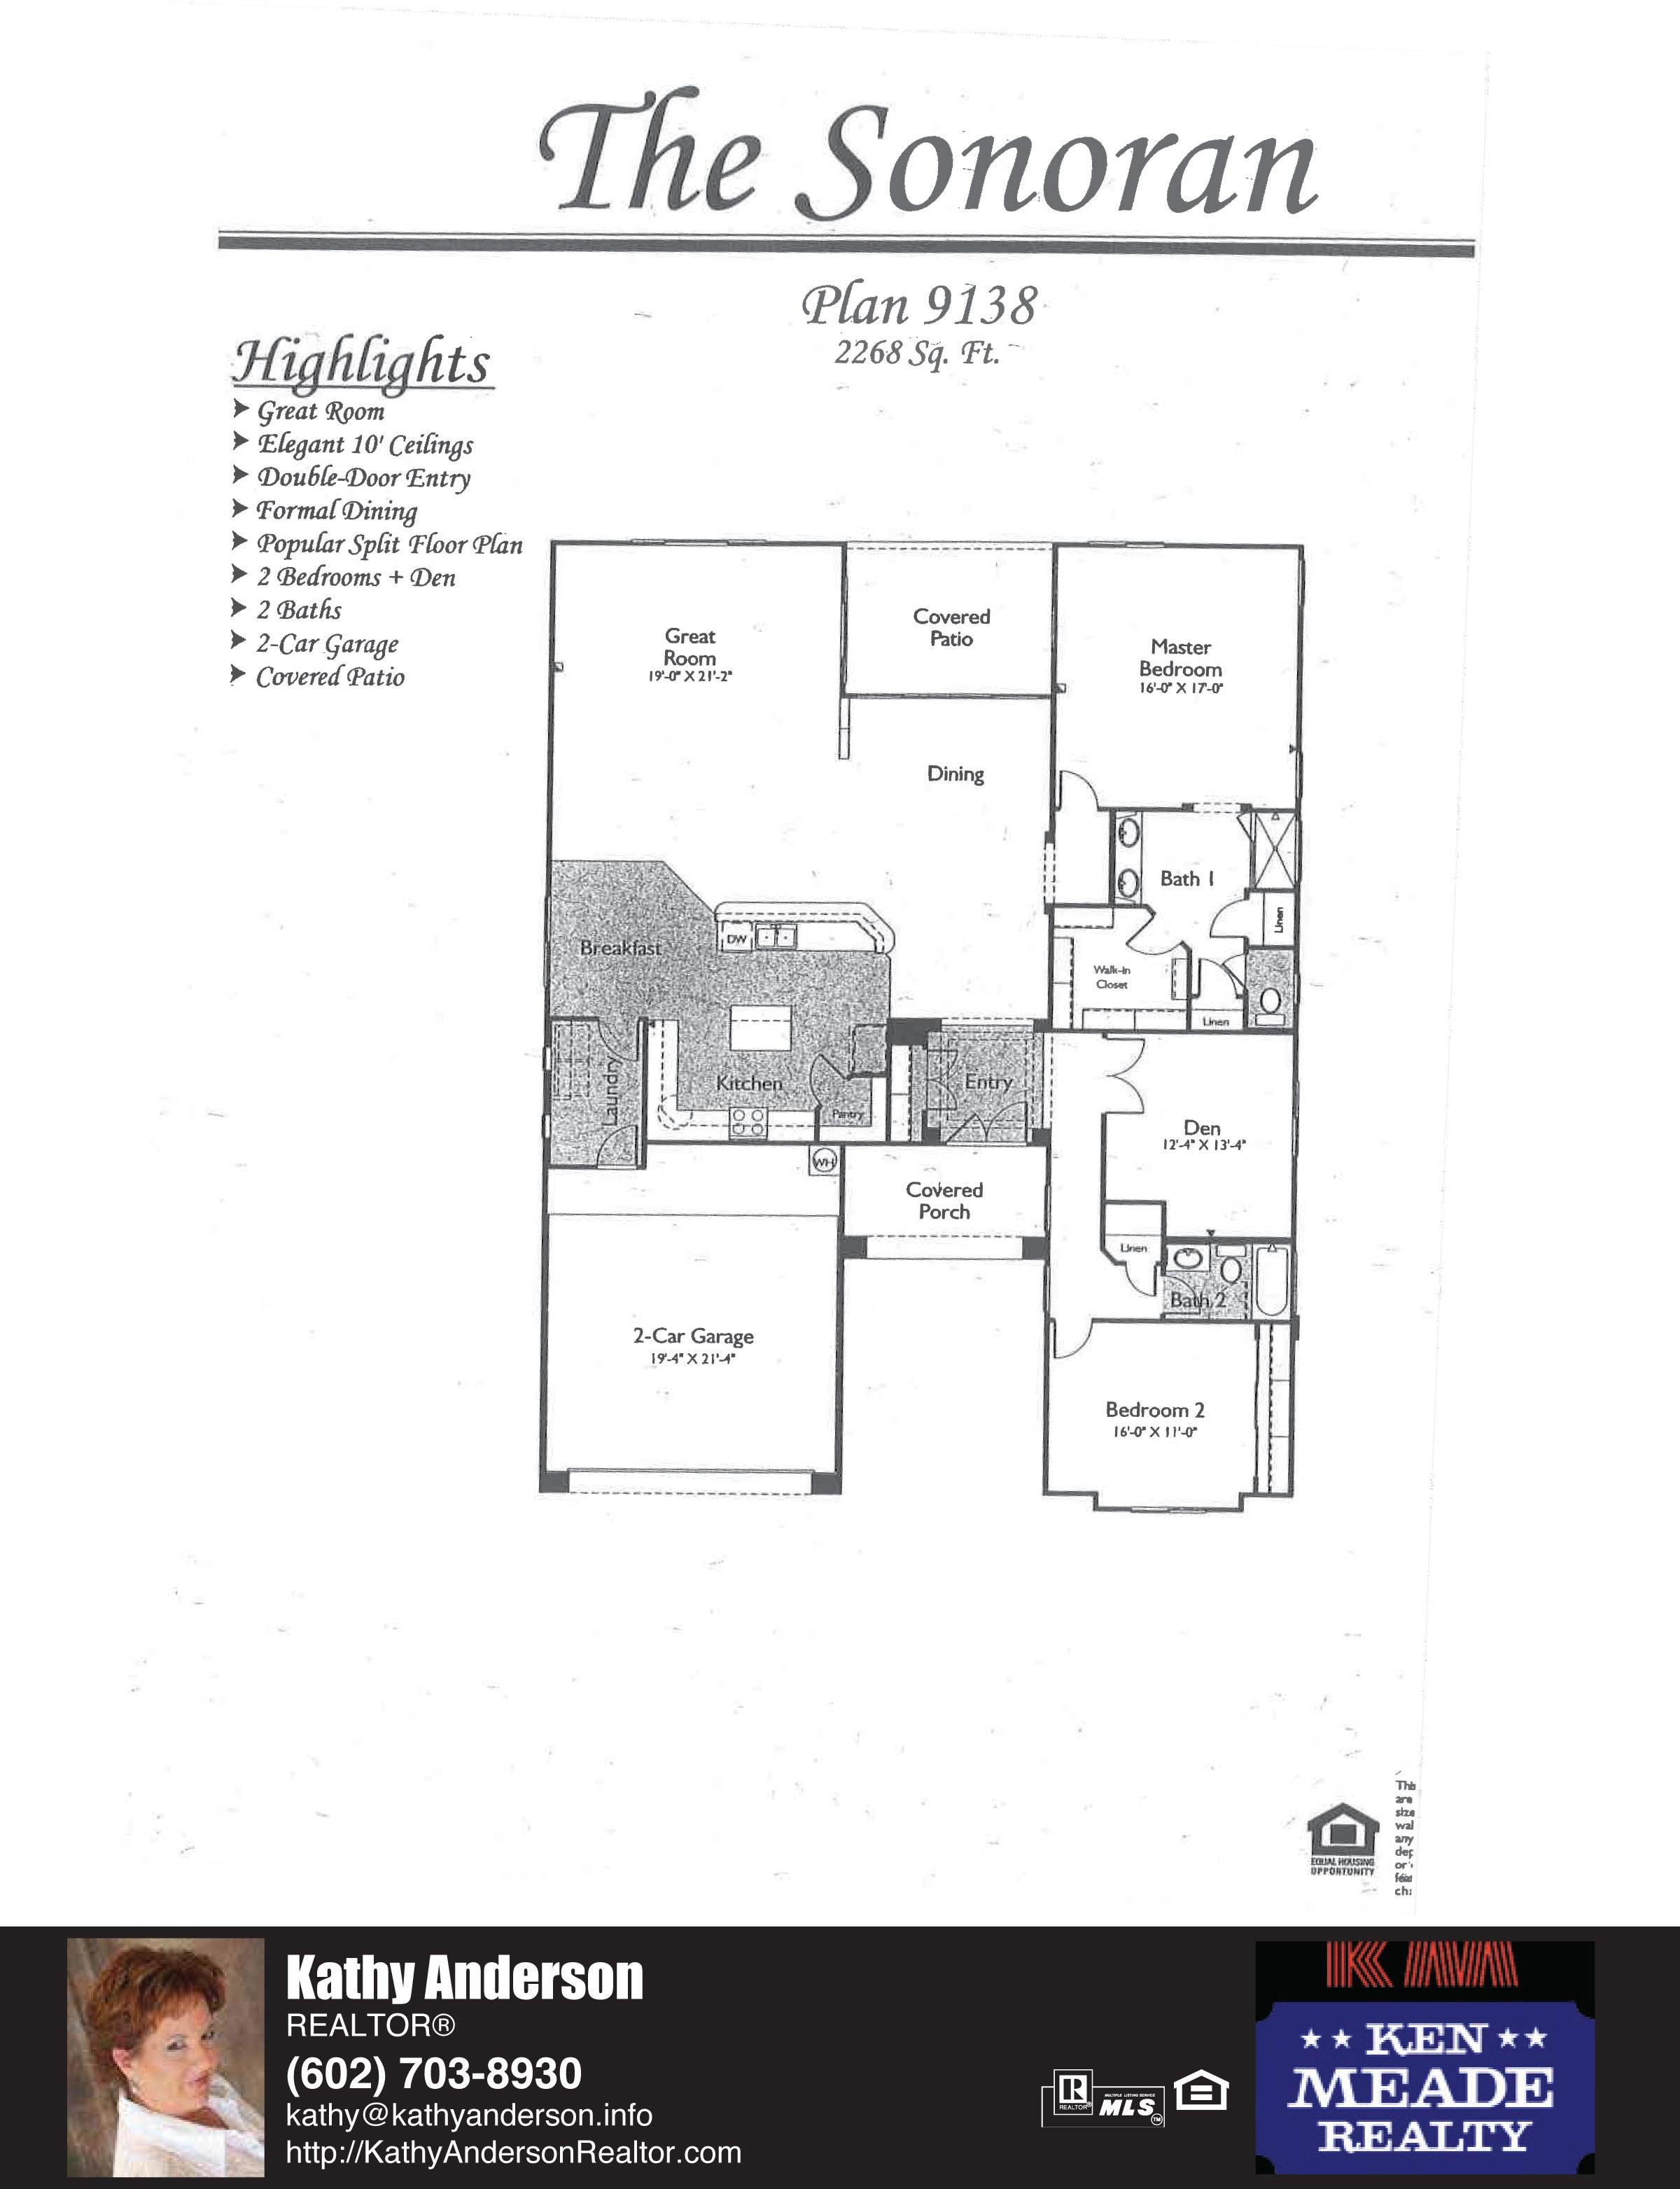 Arizona Traditions Sonoran Floor Plan Model Home Plans Floorplans Models in Surprise Arizona AZ Top Ken Meade Realty Realtor agent Kathy Anderson